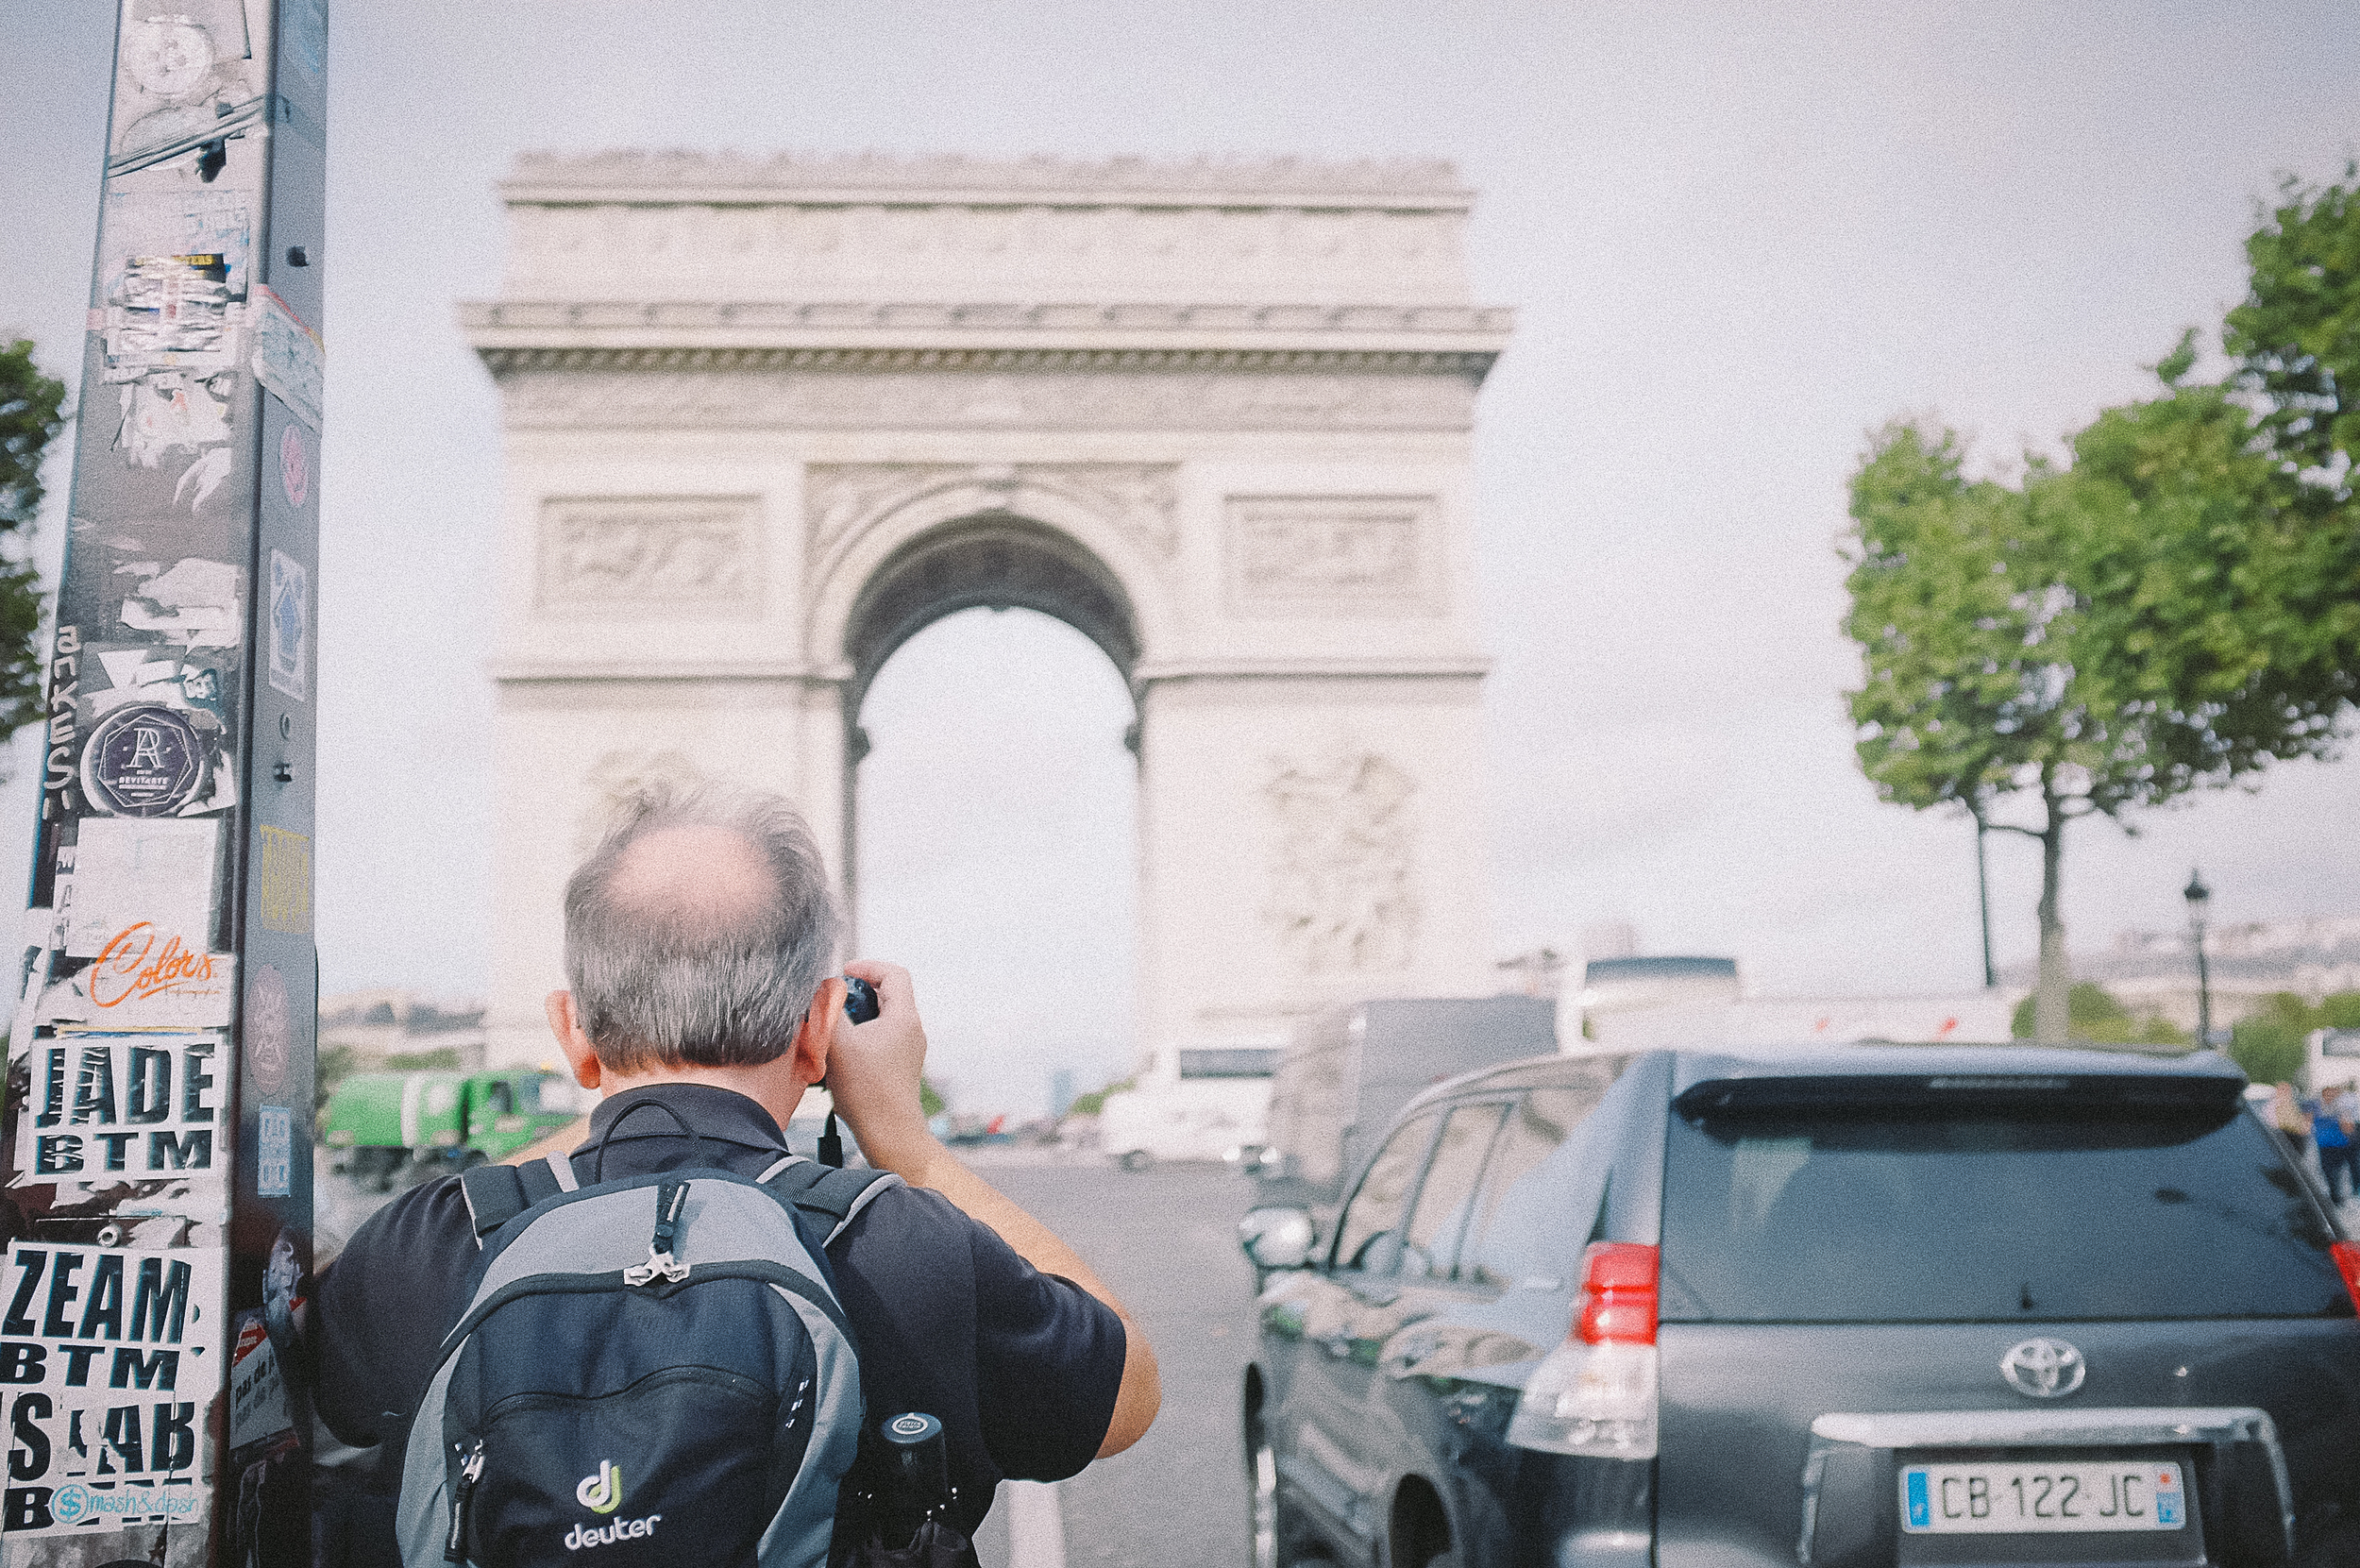 fujix100 street photography-12.jpg